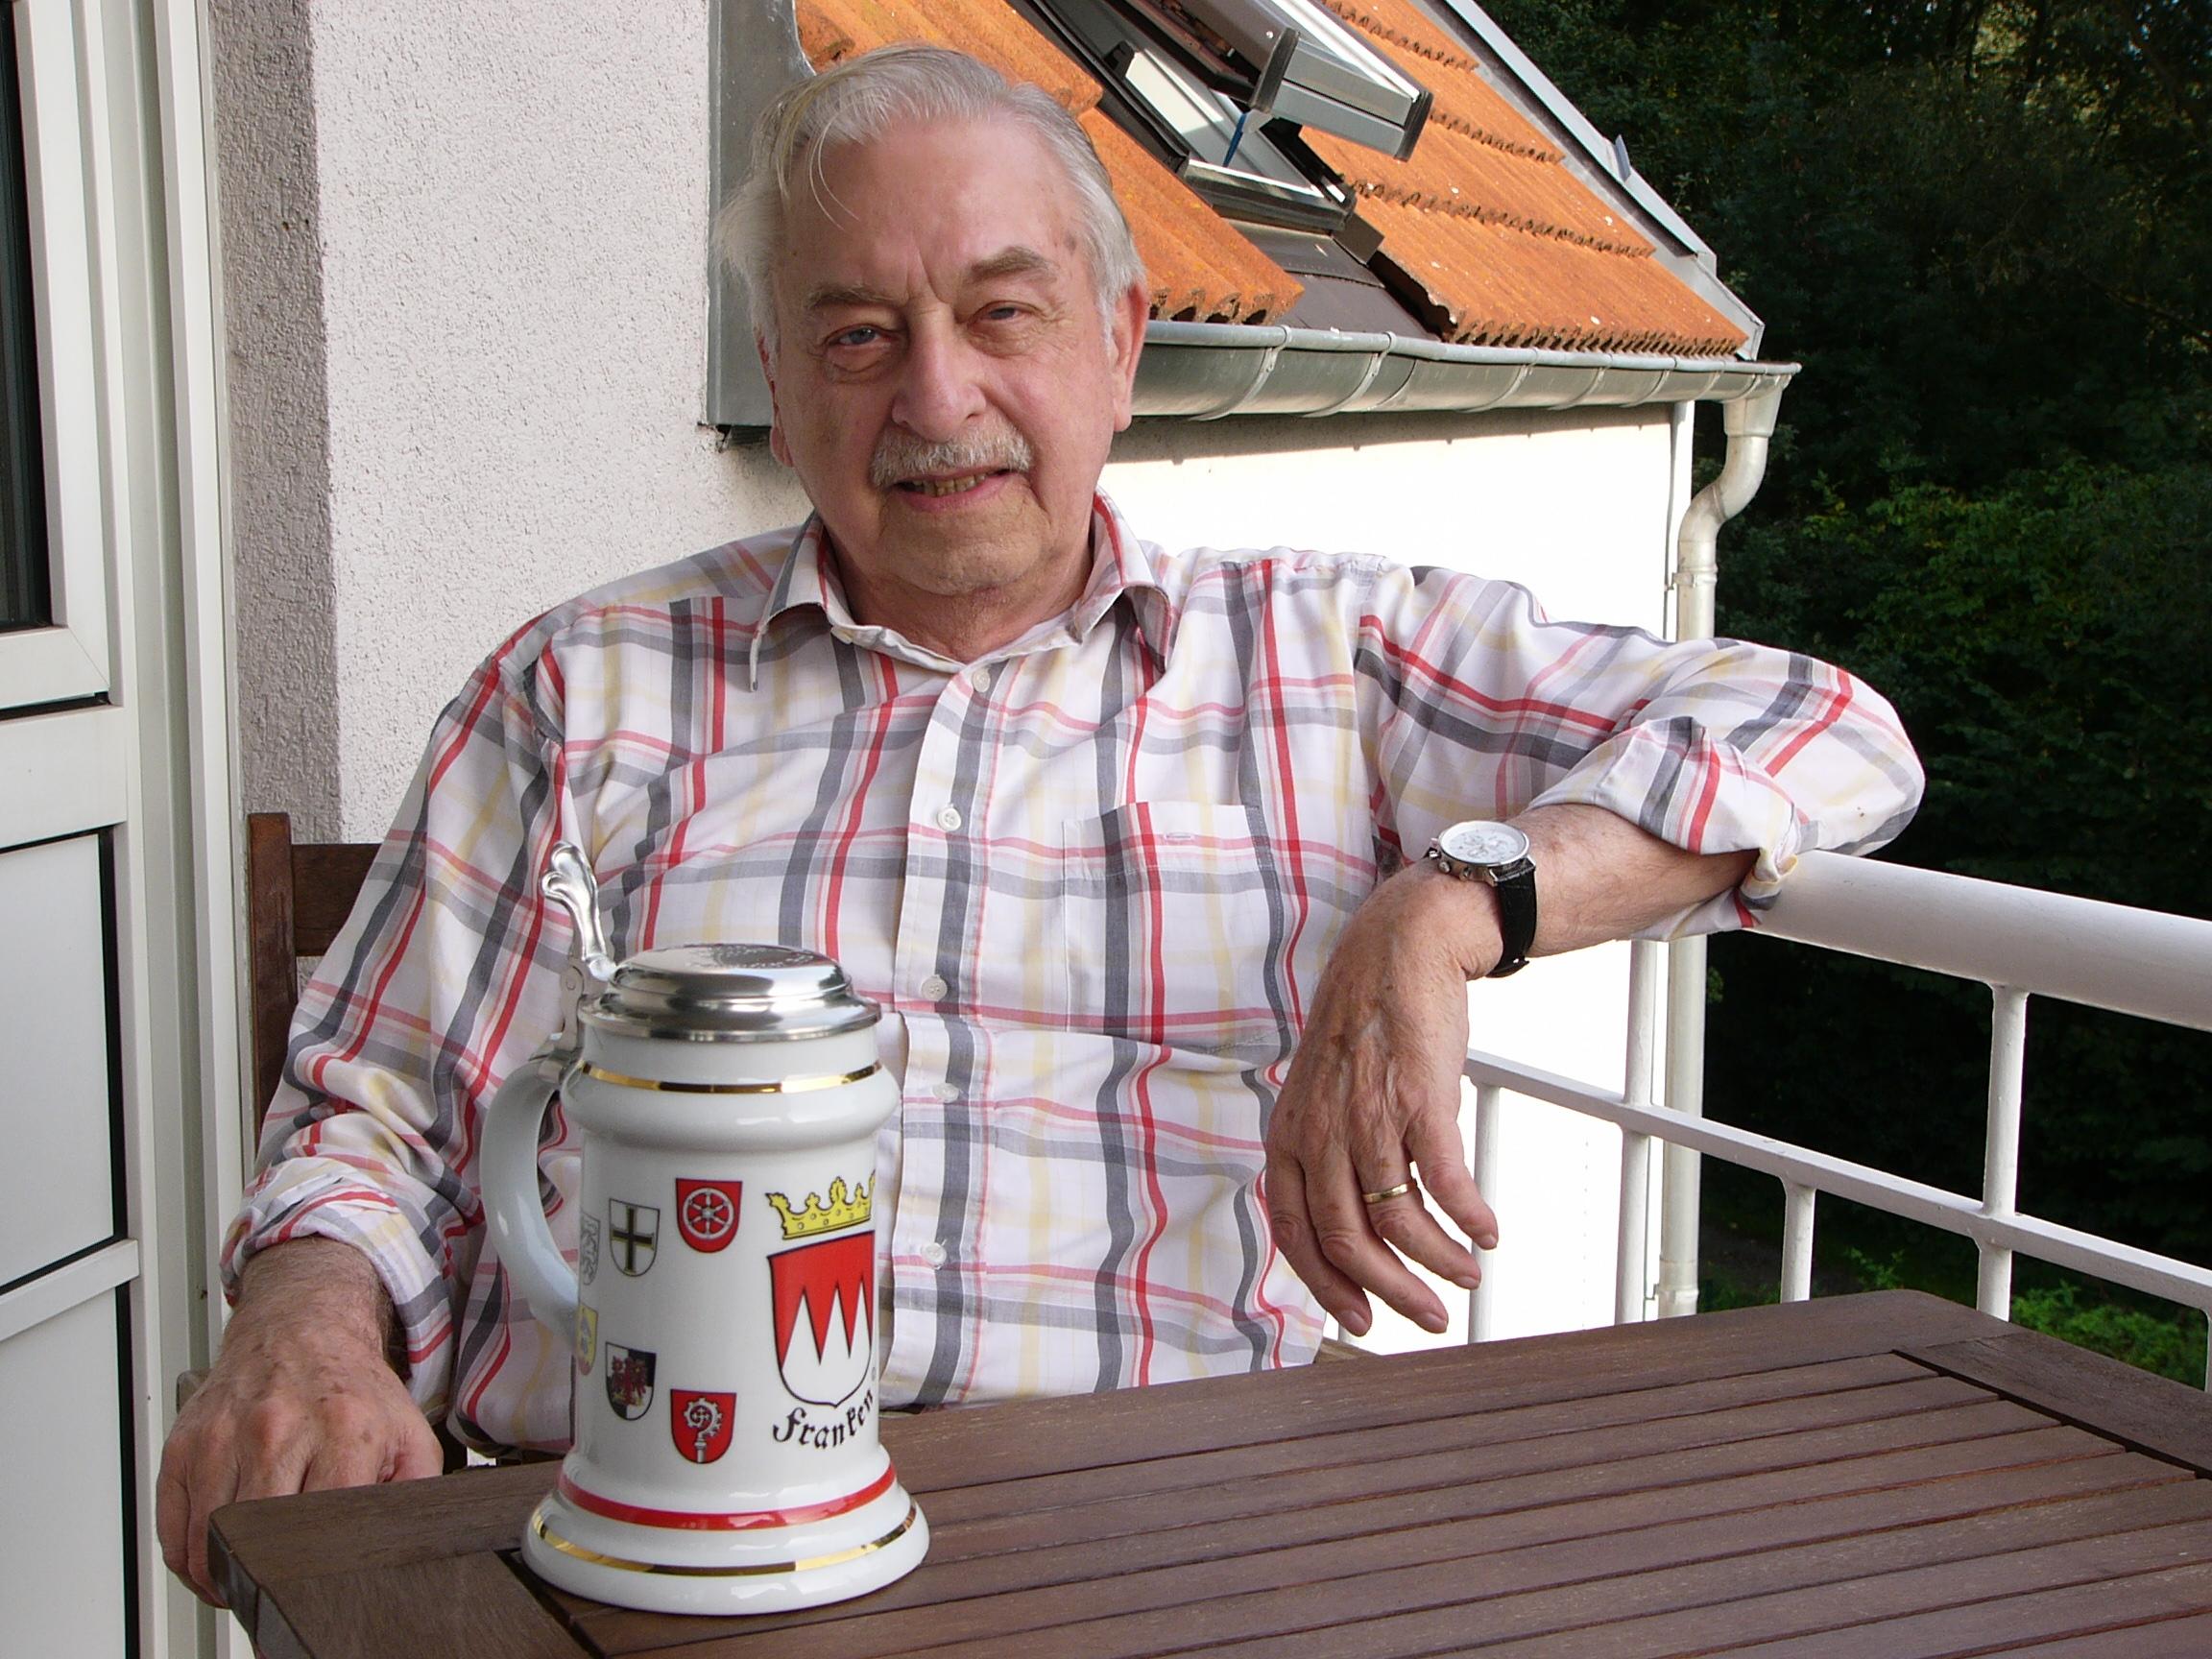 2016-04-10. Gedenken an Norbert Gramlich gestorben am 10.4.2016